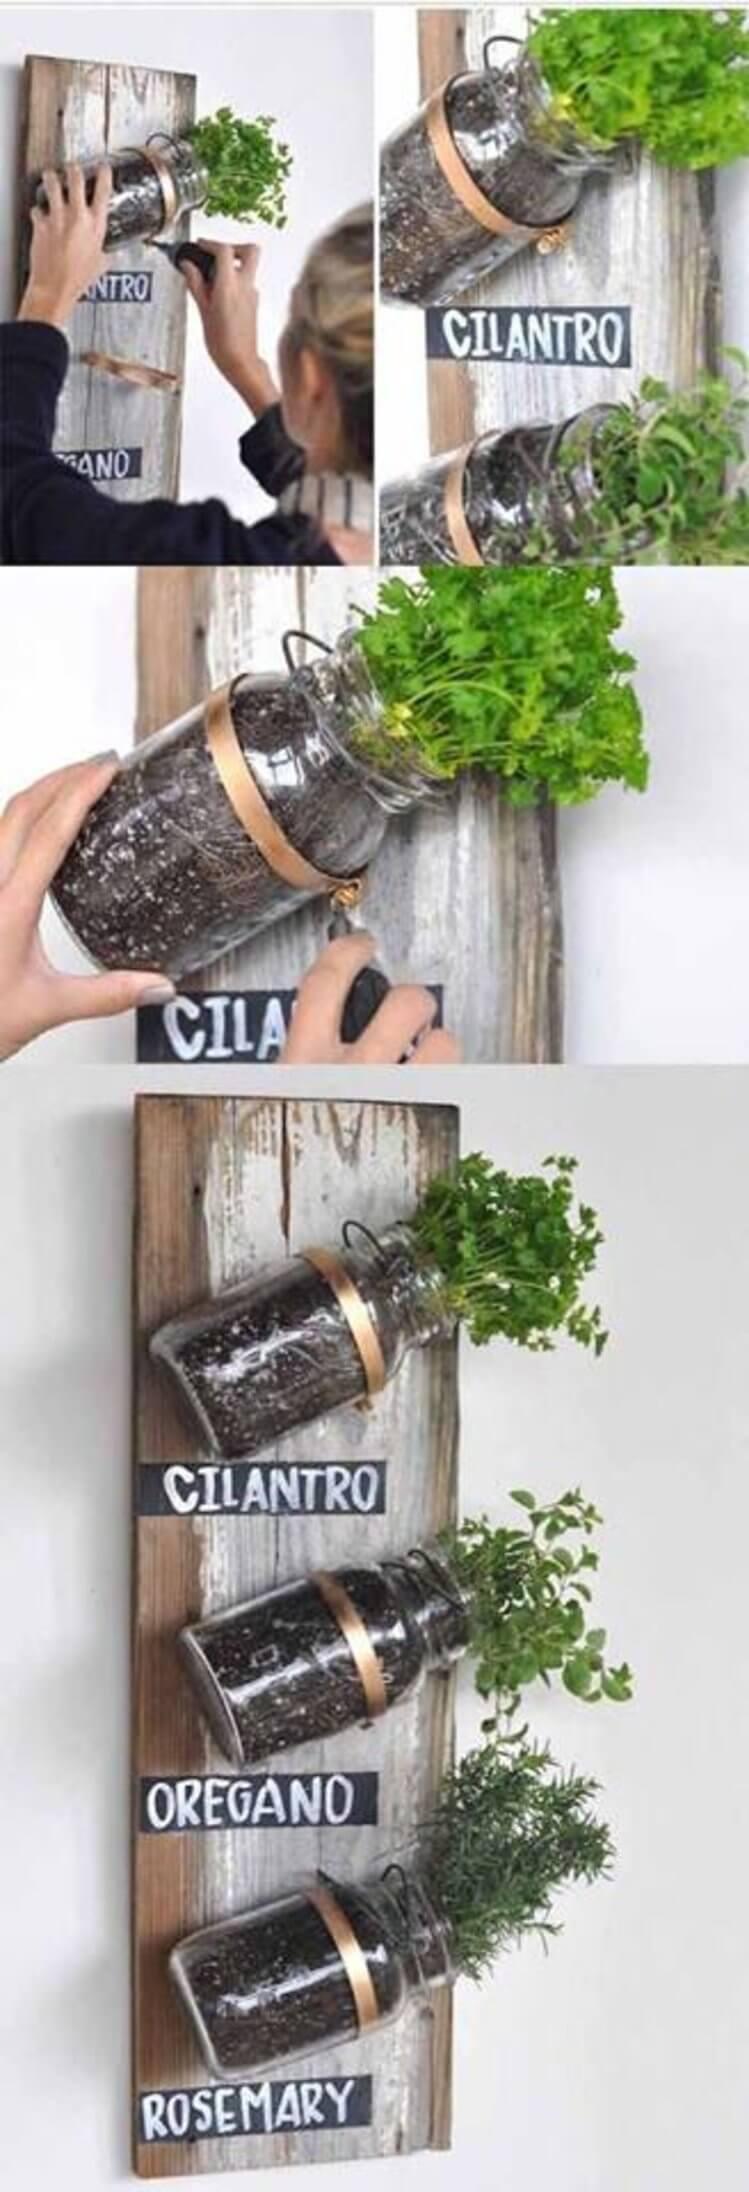 DIY Mounted Mason Jar Planter for Herb Gardening on Sturdy Wood Panel Hanging on Metallic Holders